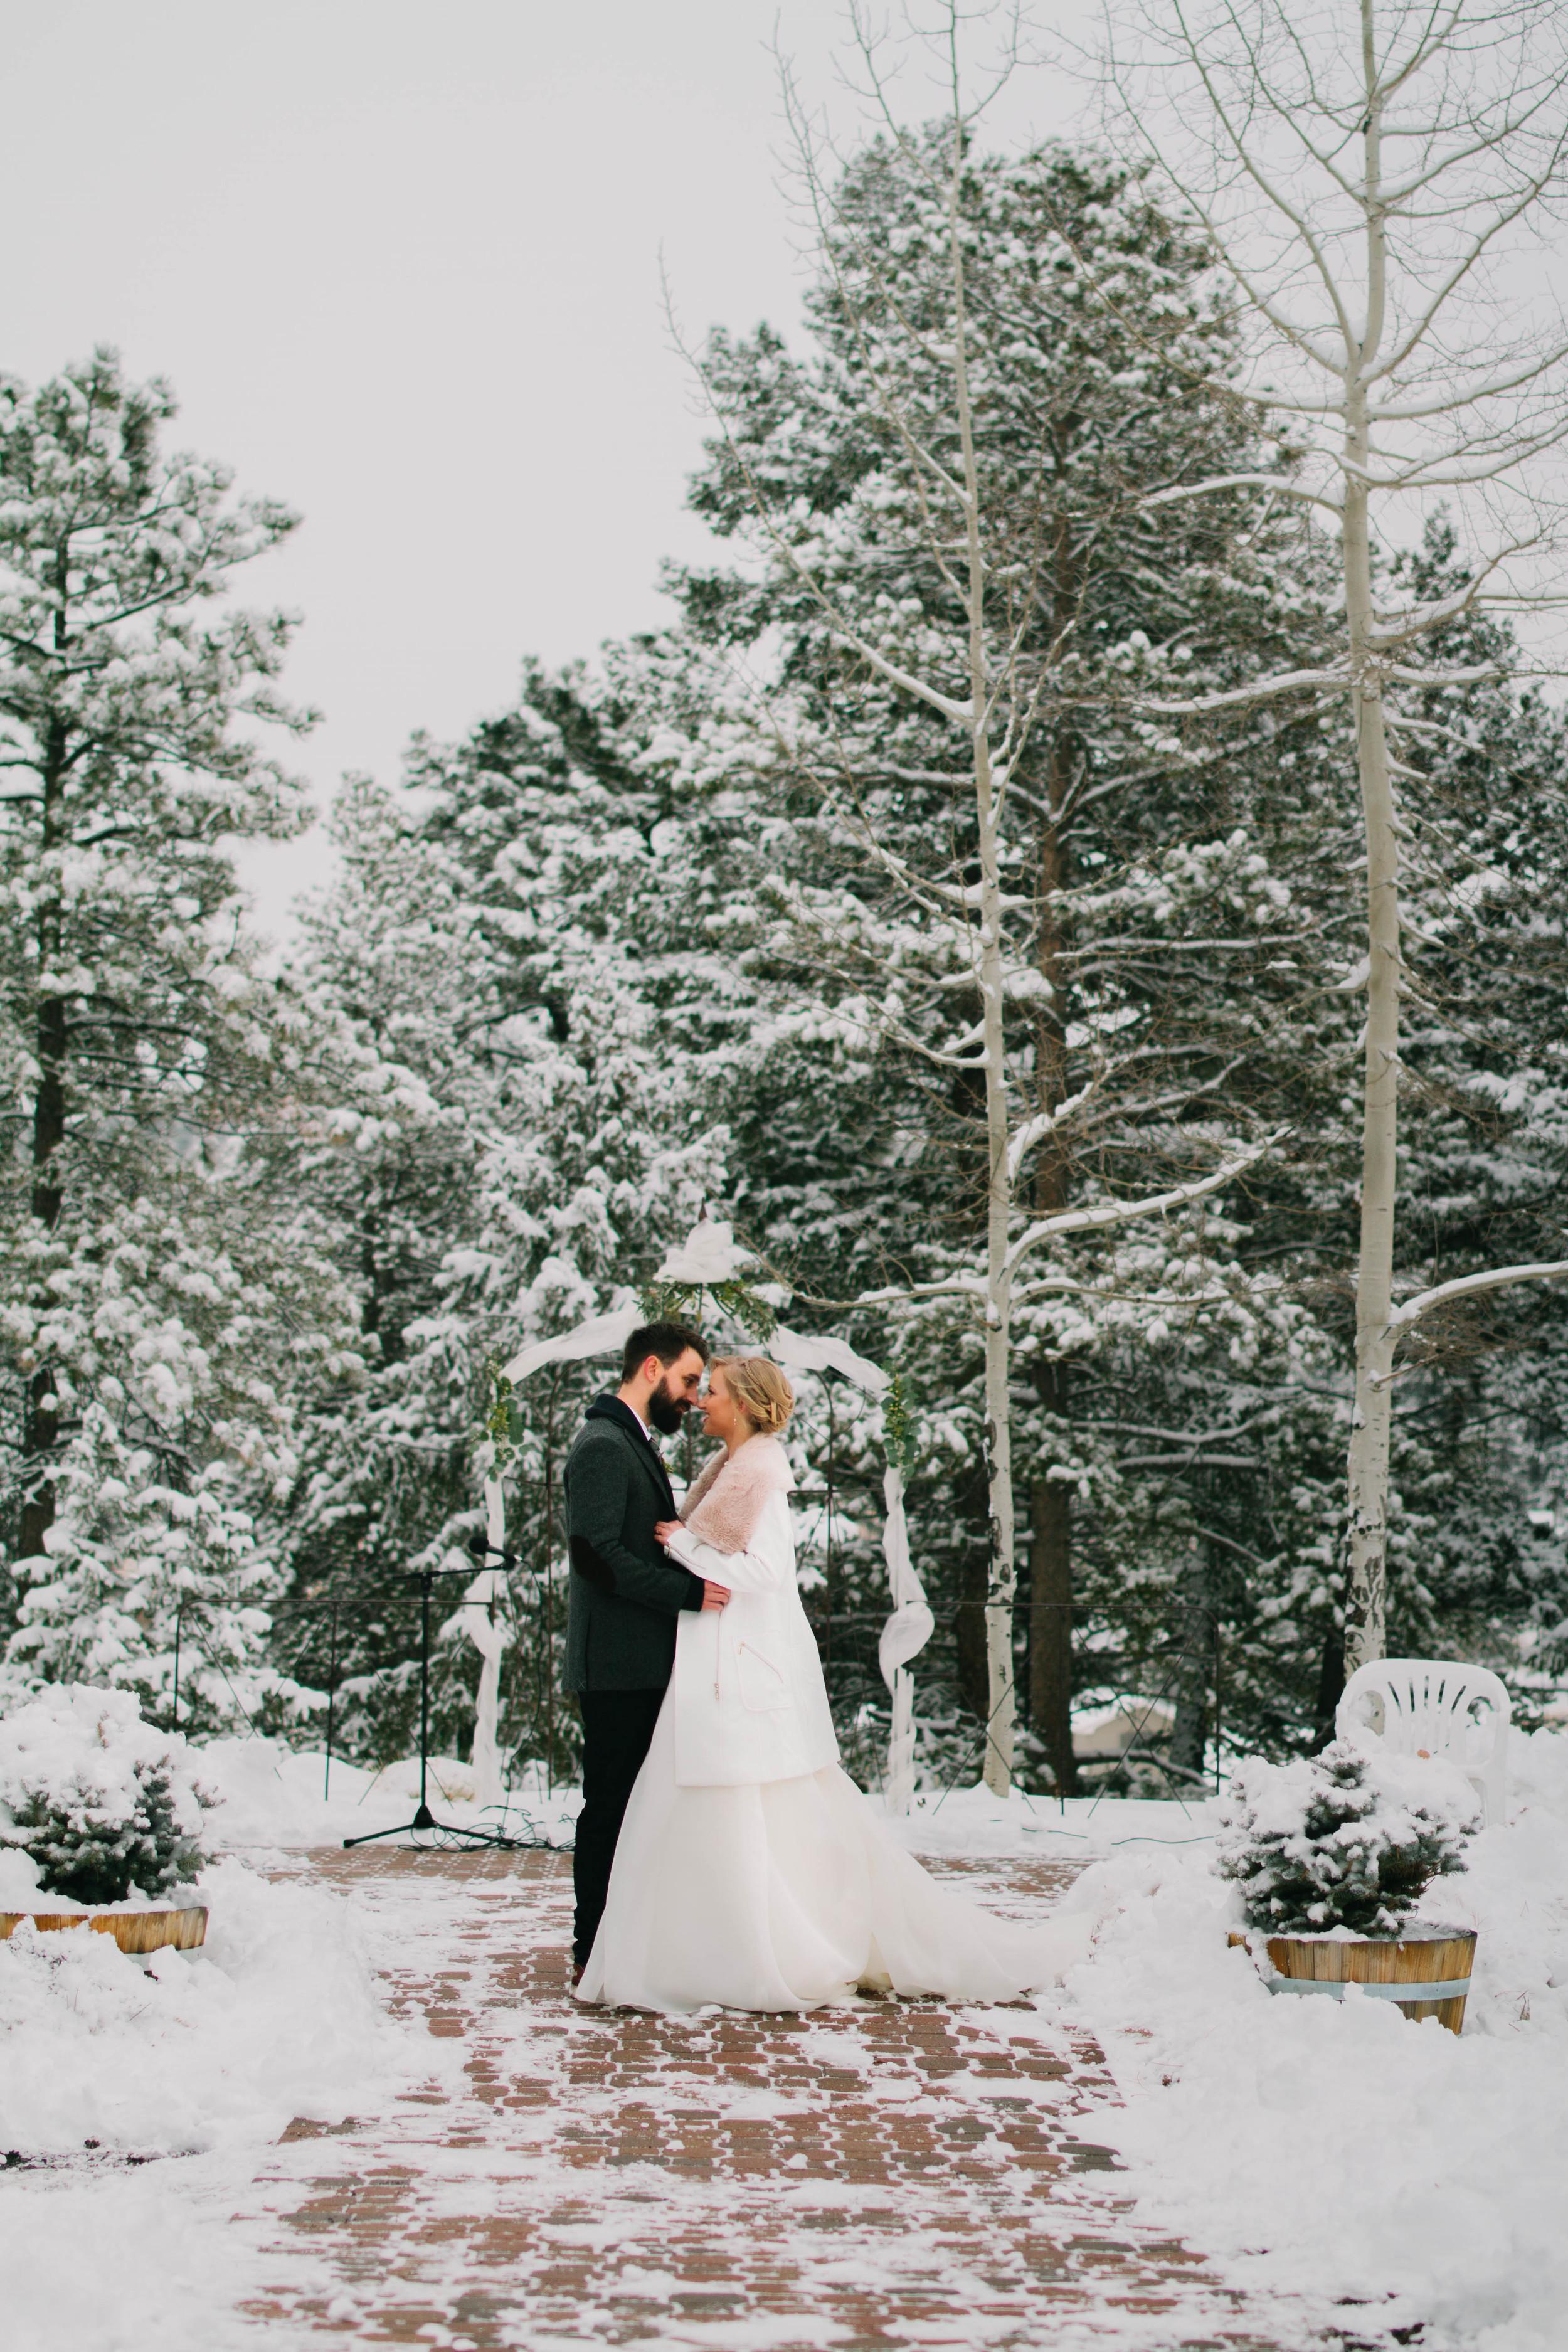 Bonin Wedding - Madeleine Bonin Photography-5850.jpg